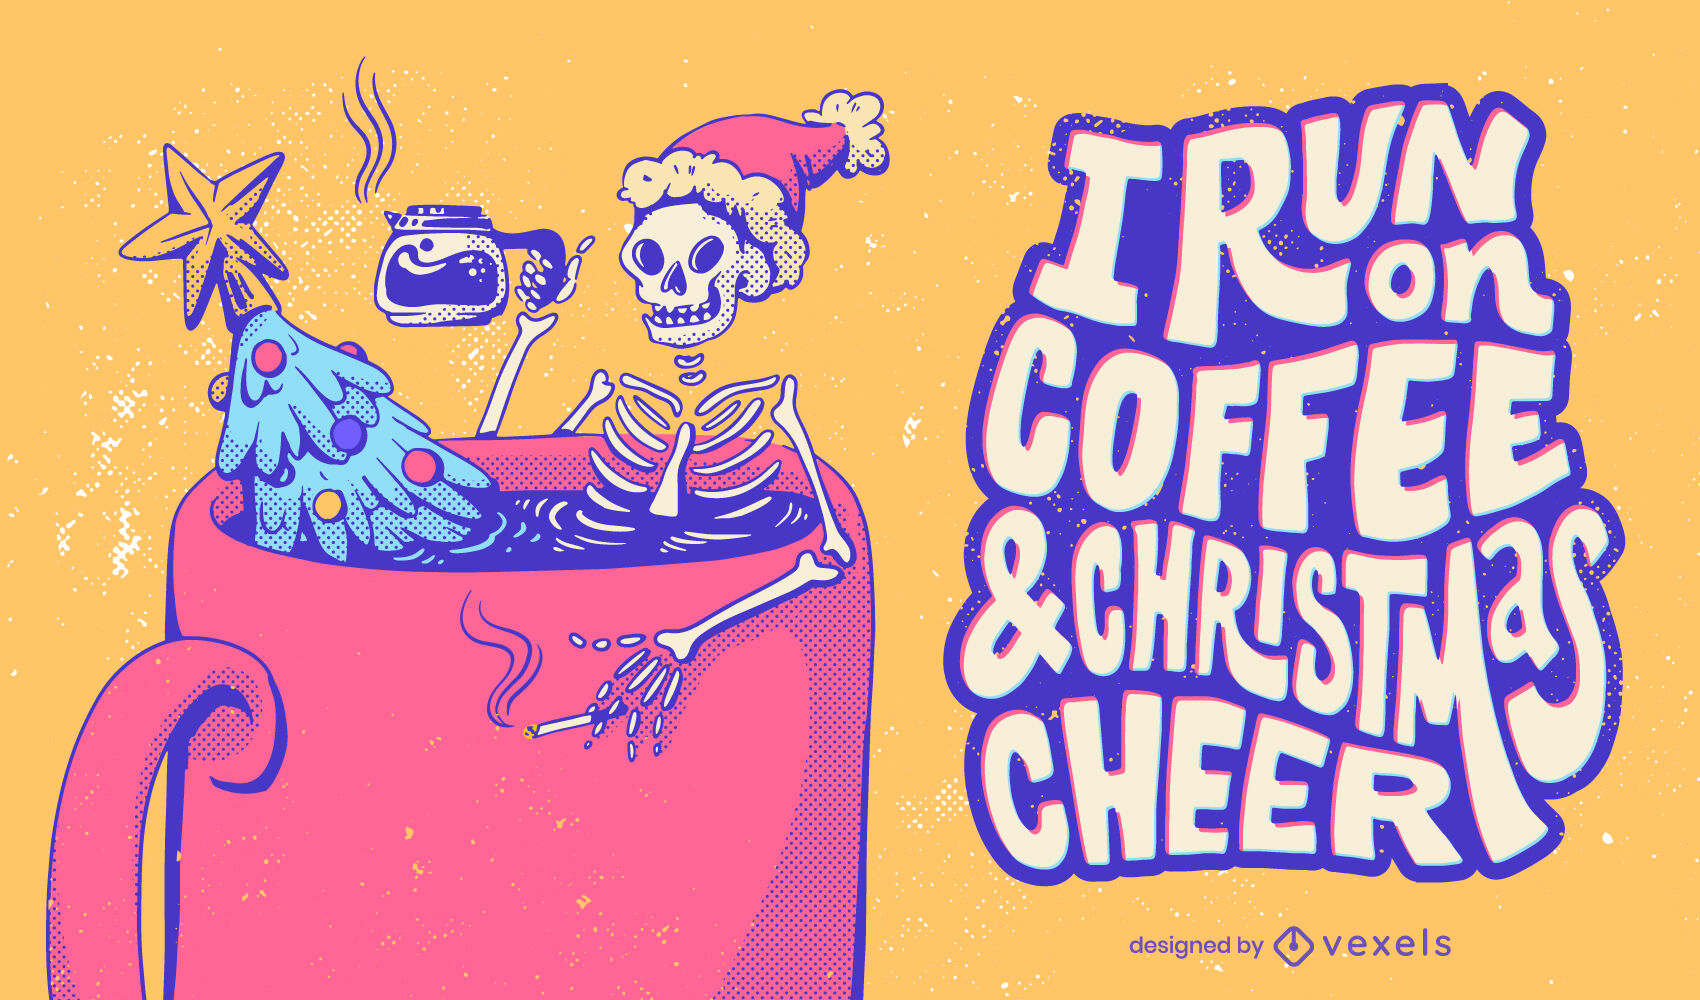 Skelett-Anti-Weihnachts-Schriftzug-Illustration